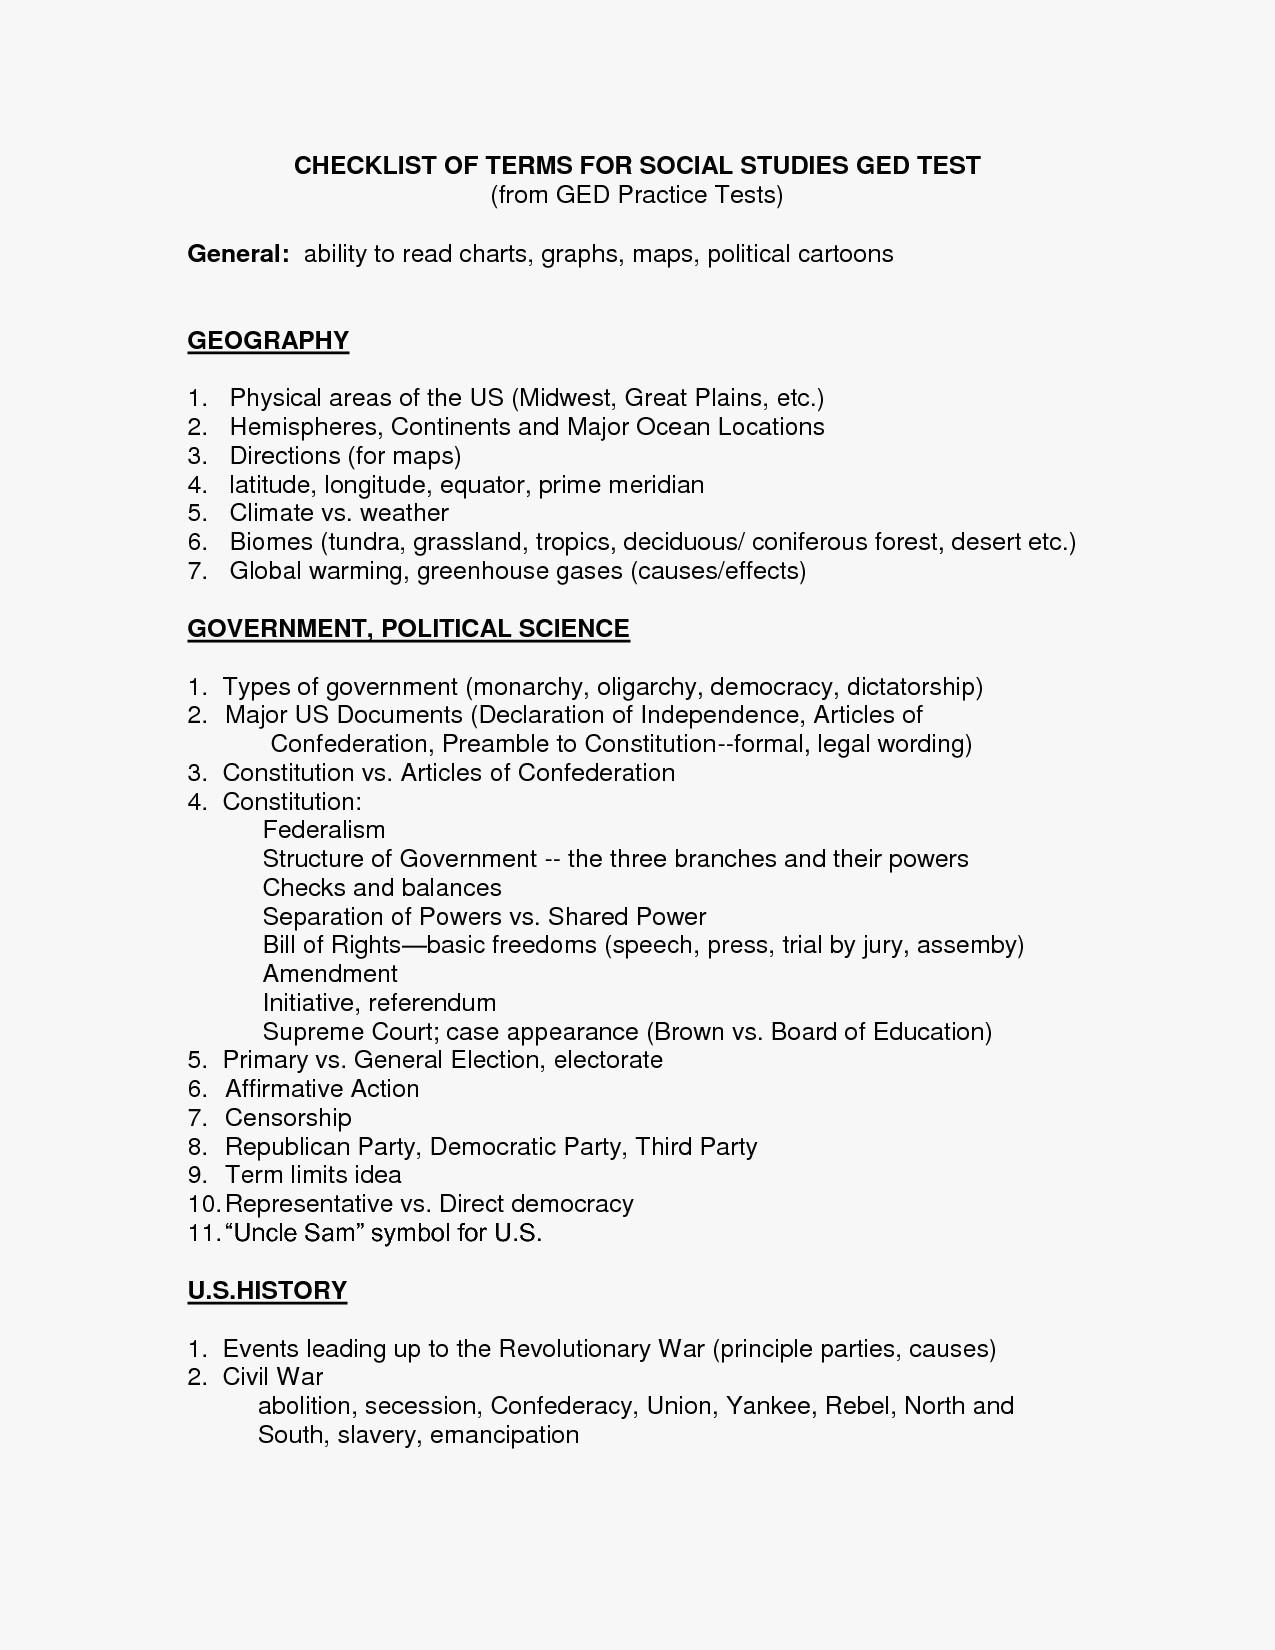 Free Printable Ged Math Worksheets Ged Tasc Class - Classy World | Free Printable Ged Science Worksheets